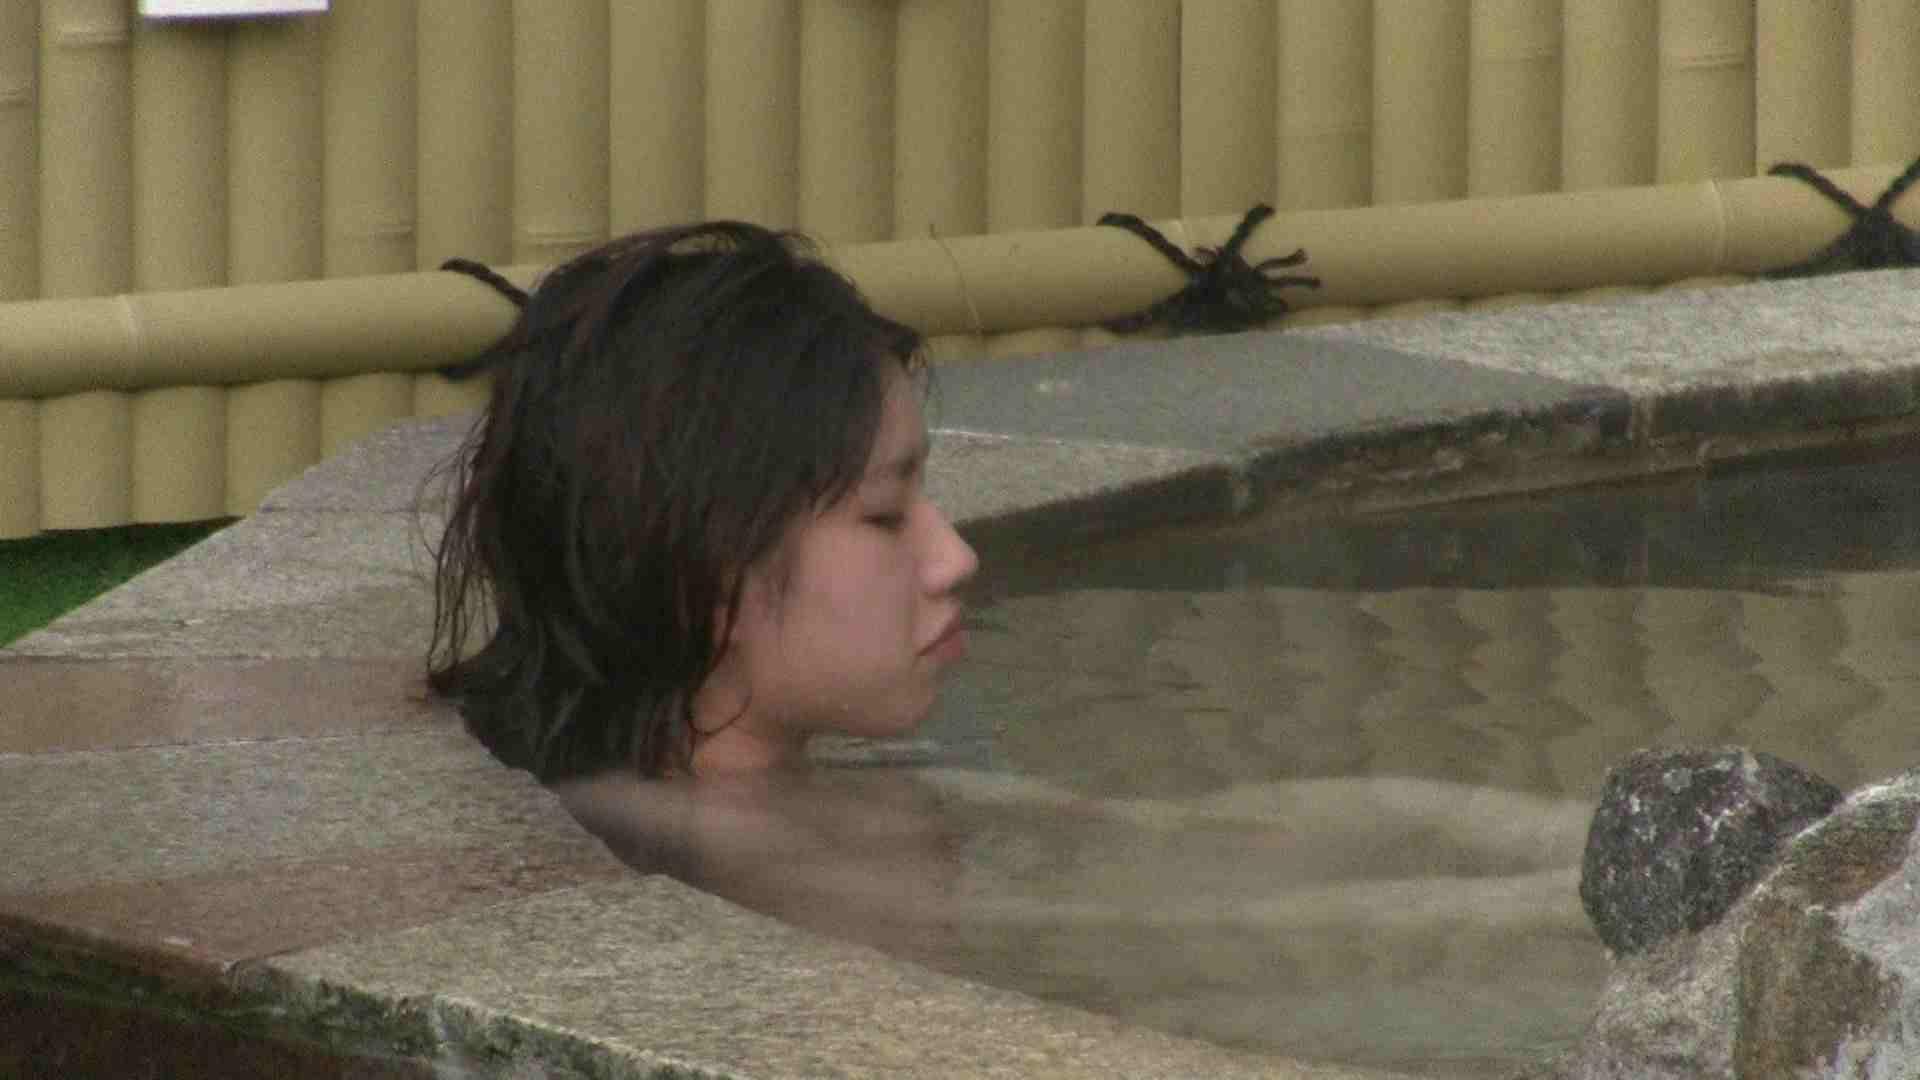 Aquaな露天風呂Vol.230 HなOL | 盗撮  83pic 74